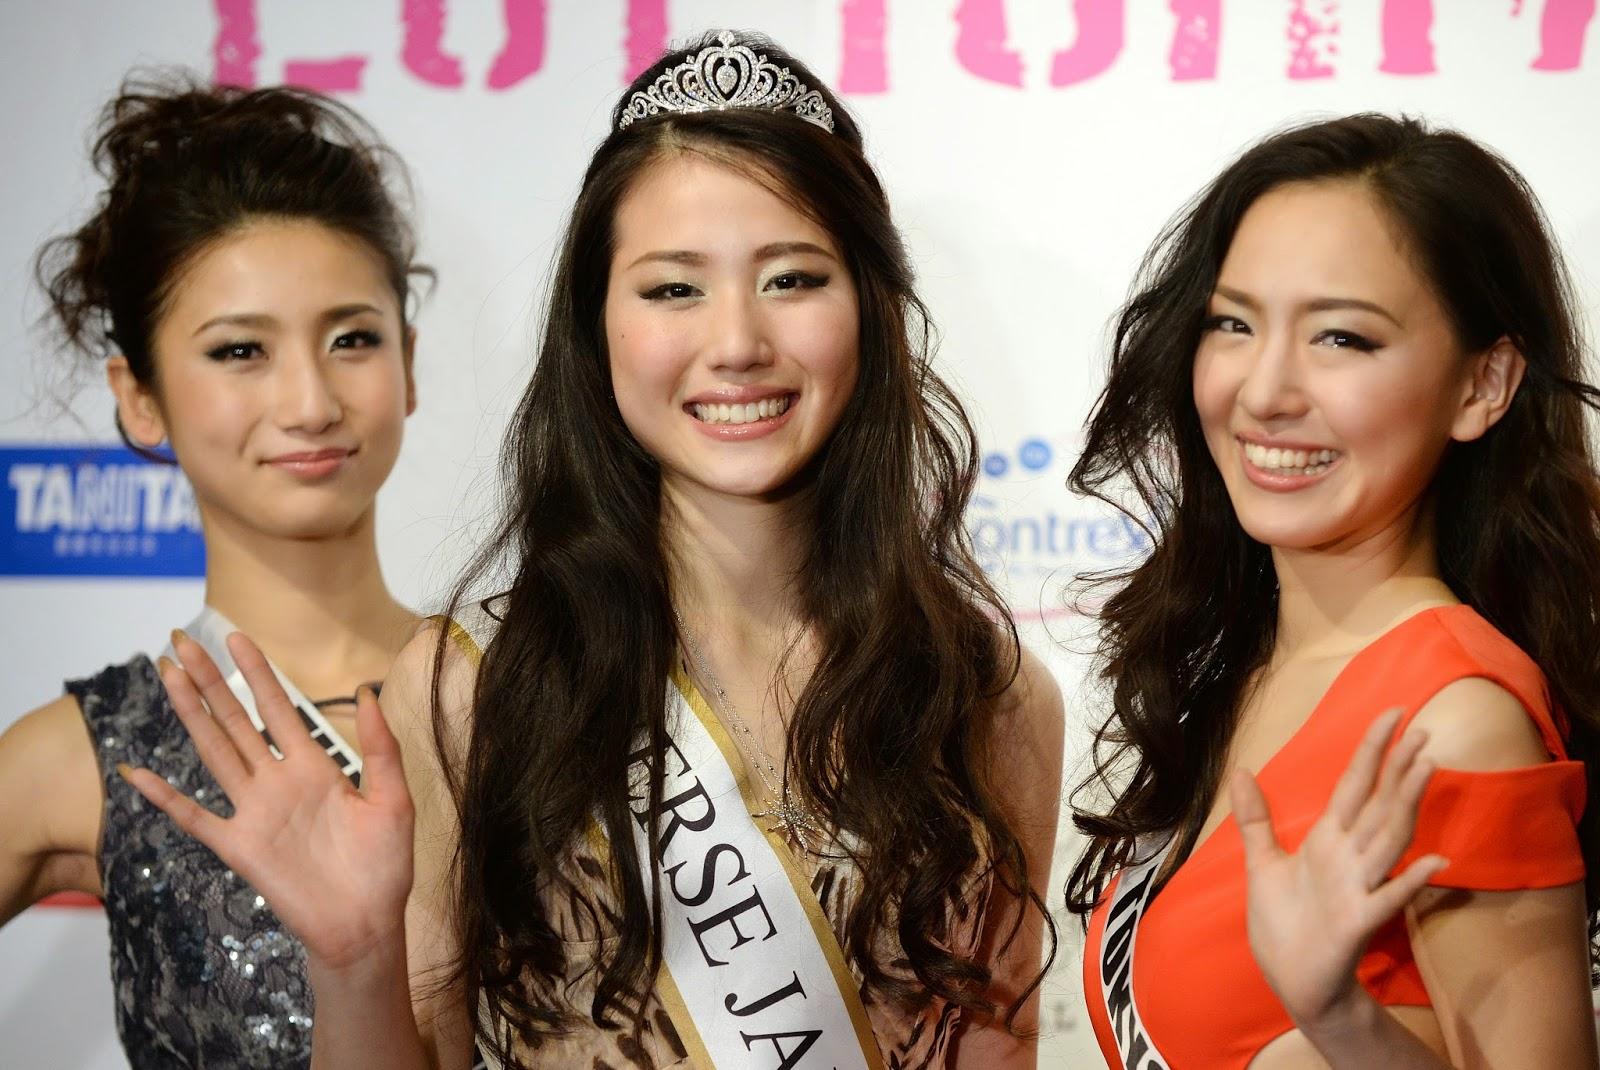 Beauty, Beauty Pageant, College Girl, Crowned, Entertainment, Japan, Japan Beauty Pageant, Keiko Tsuji, Miss Universe 2014, Tokyo, Winner of Miss Japan,